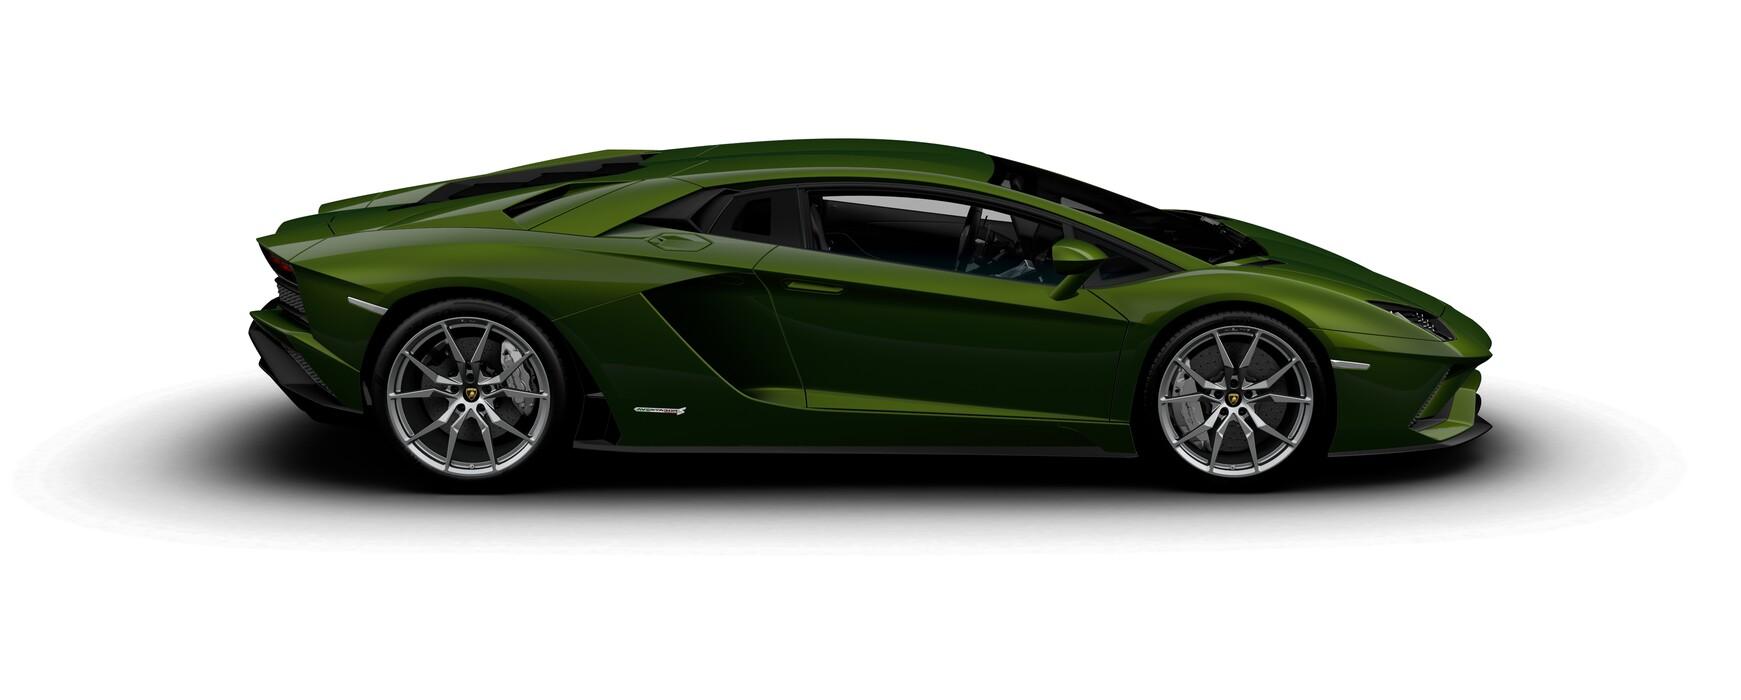 Lamborghini Aventador S Coupe metallic Verde Ermes side view